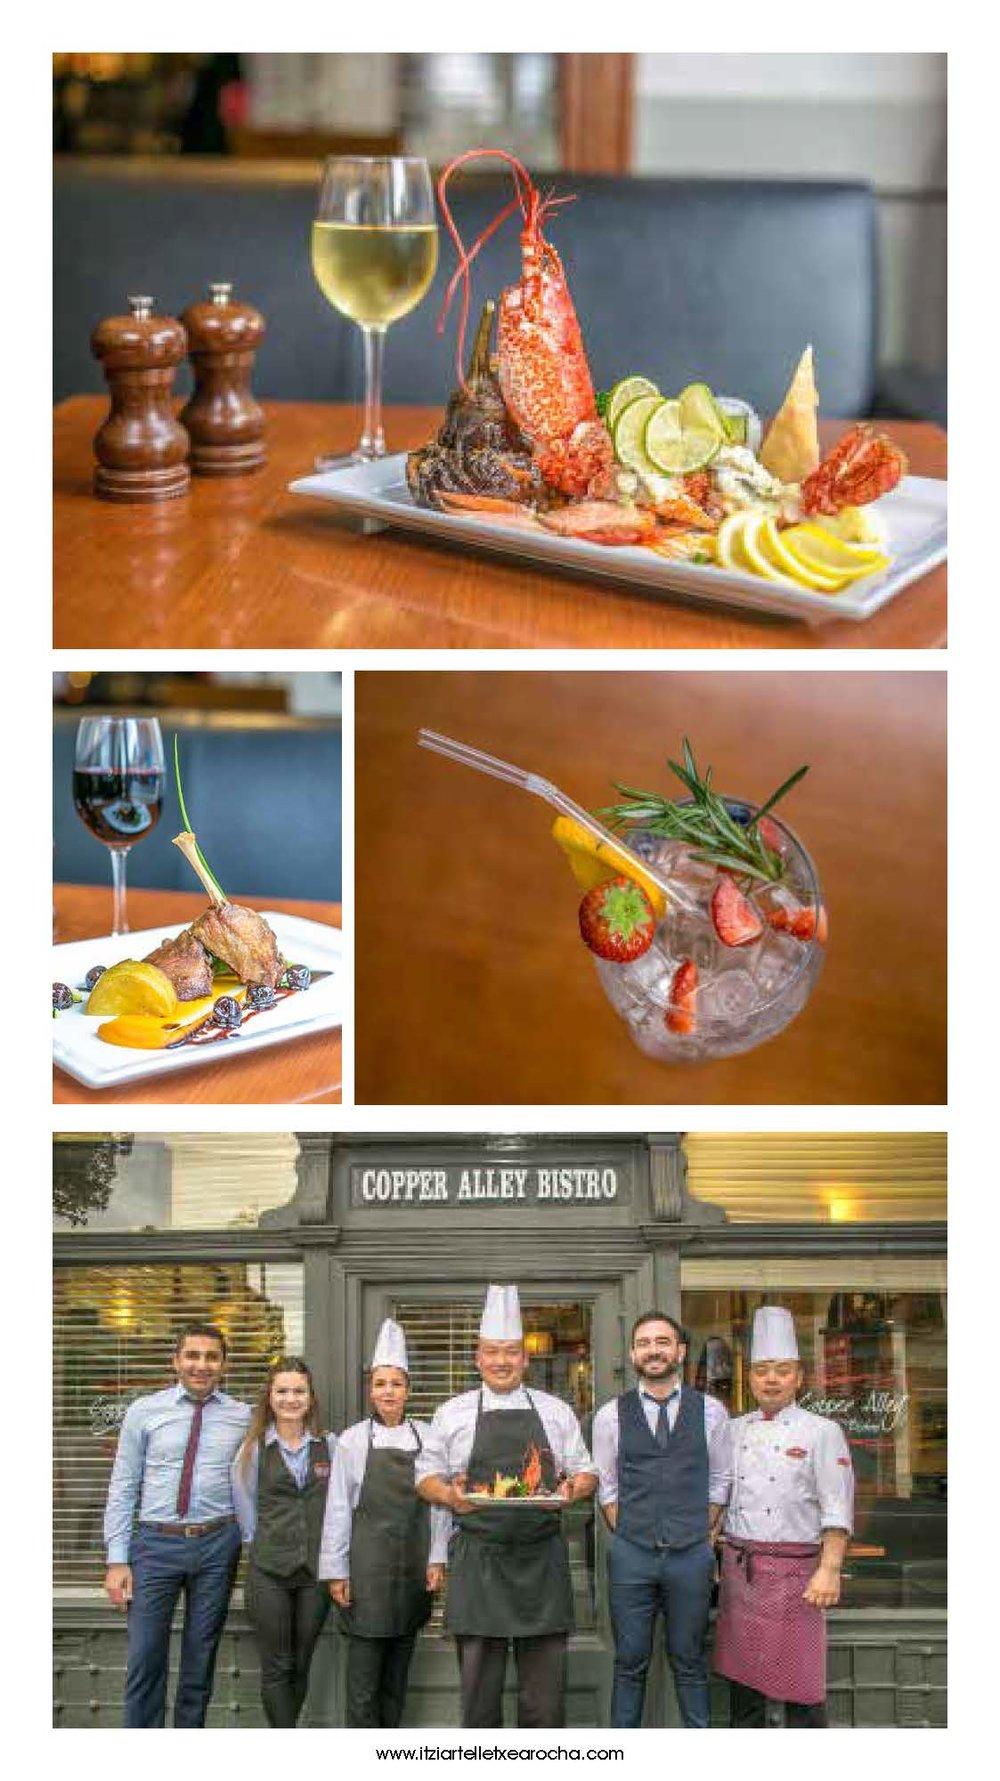 Instagram Live stories Cooper Alley Bistro Food.jpg